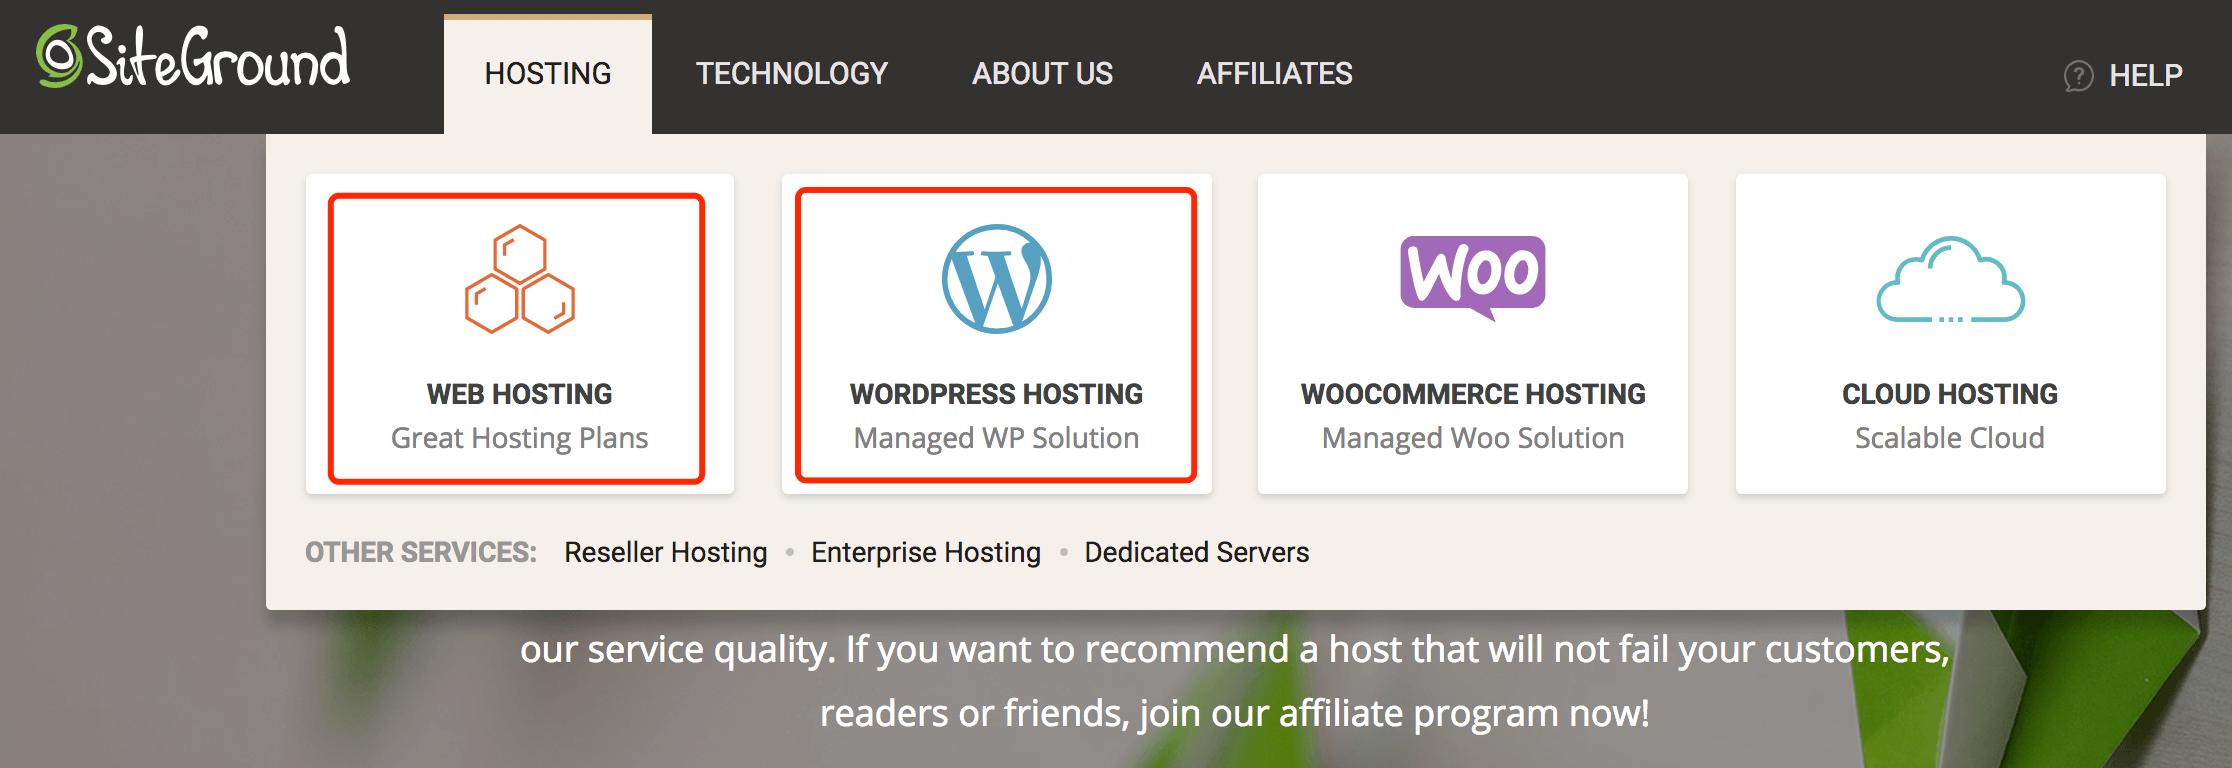 SiteGround虚拟主机选购、域名解析、SSL证书和Wordpress安装